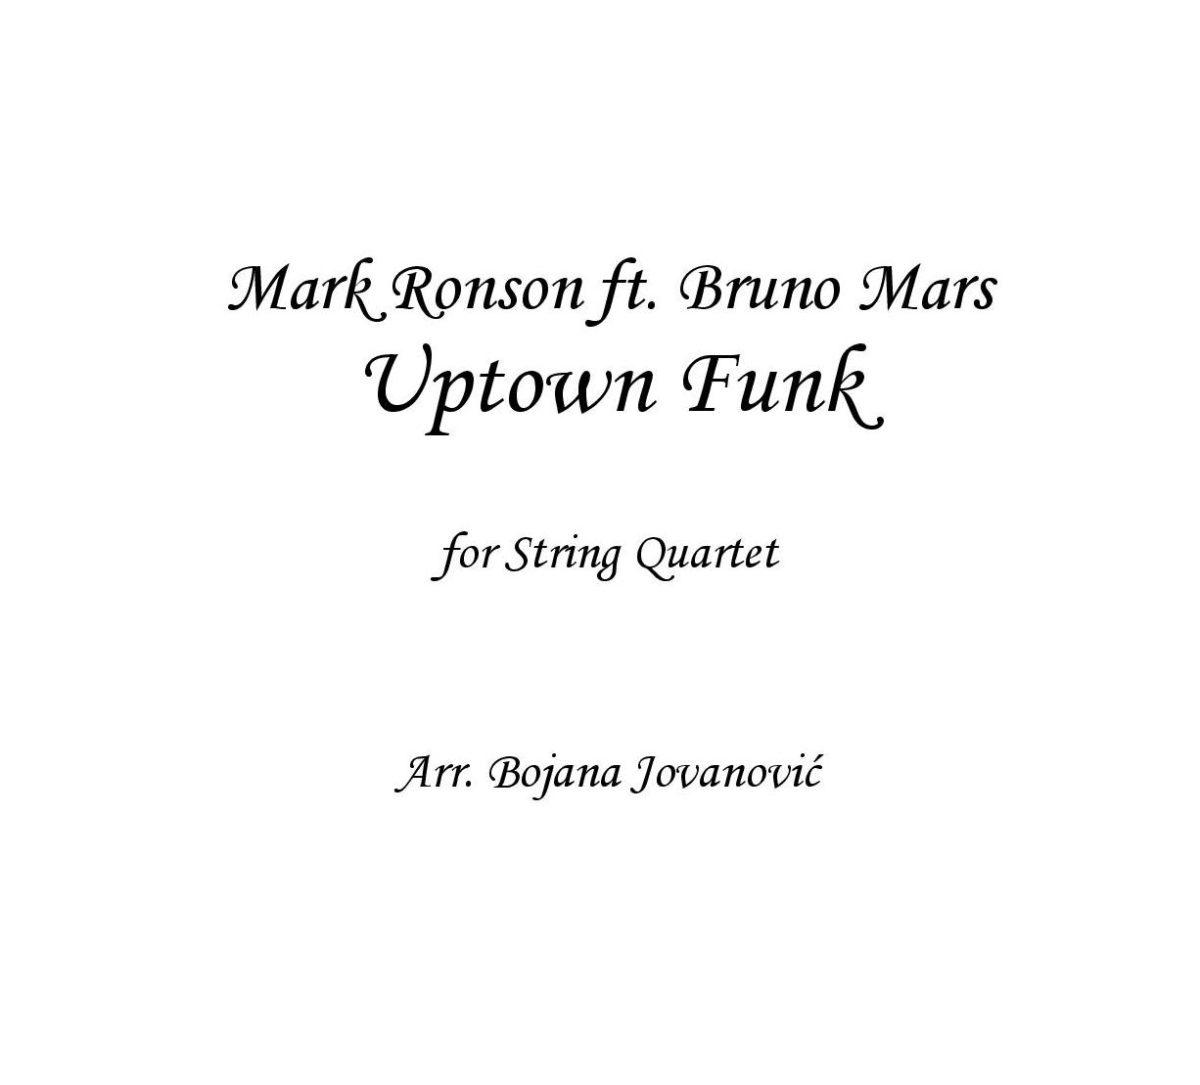 Uptown Funk (Mark Ronson ft Bruno Mars) - Sheet Music